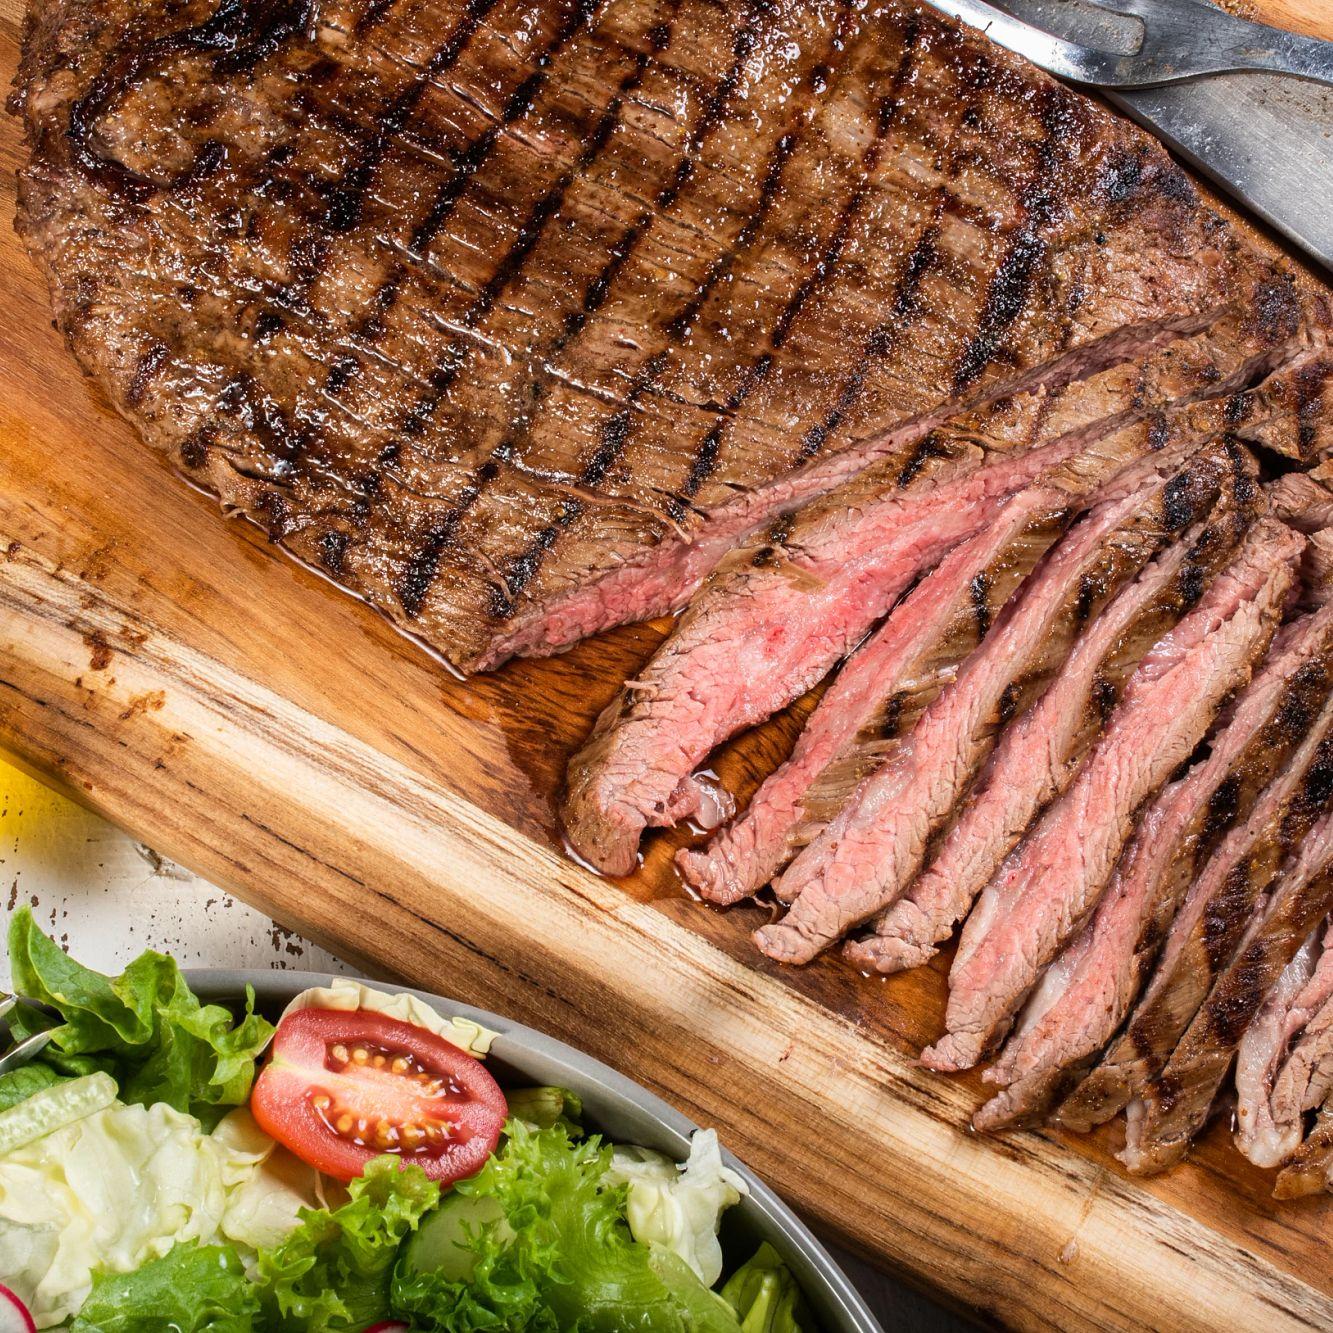 Beer & Mustard Marinated Flank Steak